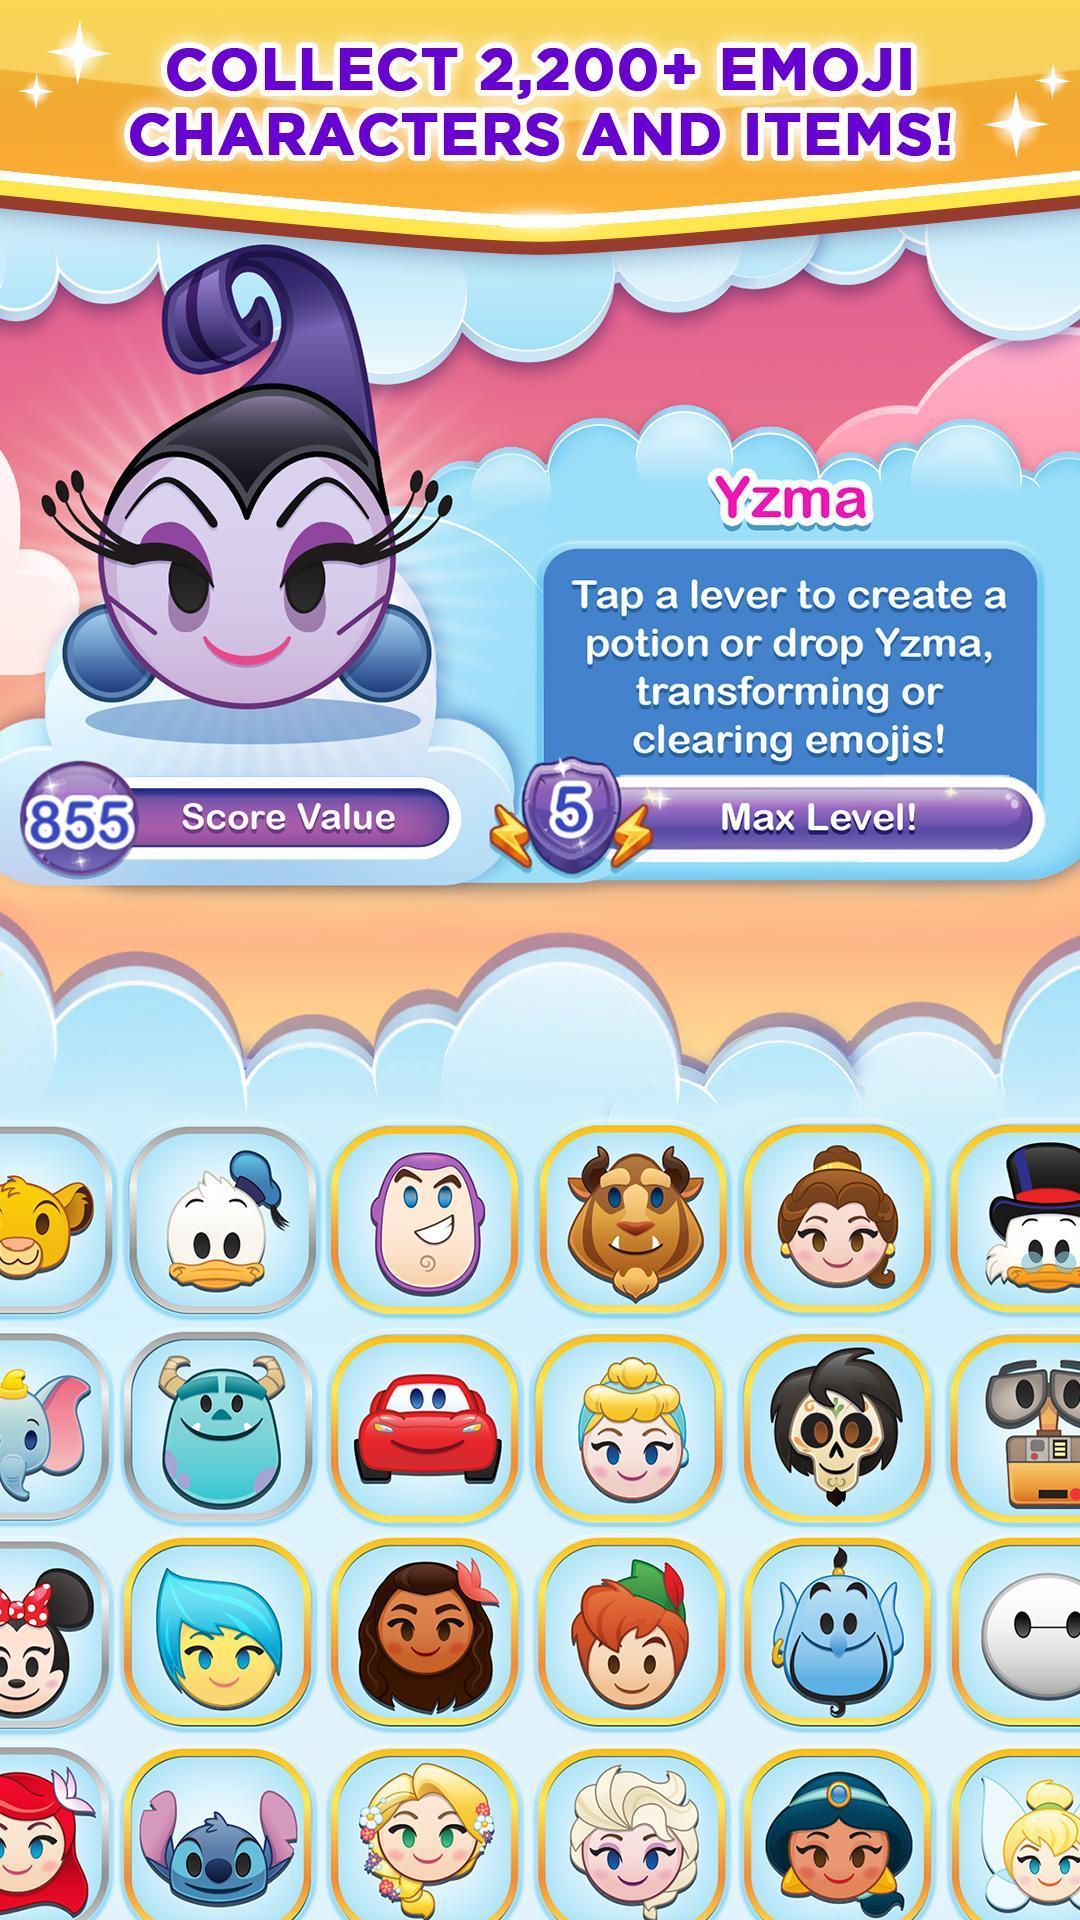 Disney Emoji Blitz For Android  Apk Download with Disney Emoji Blitz Events Calendar